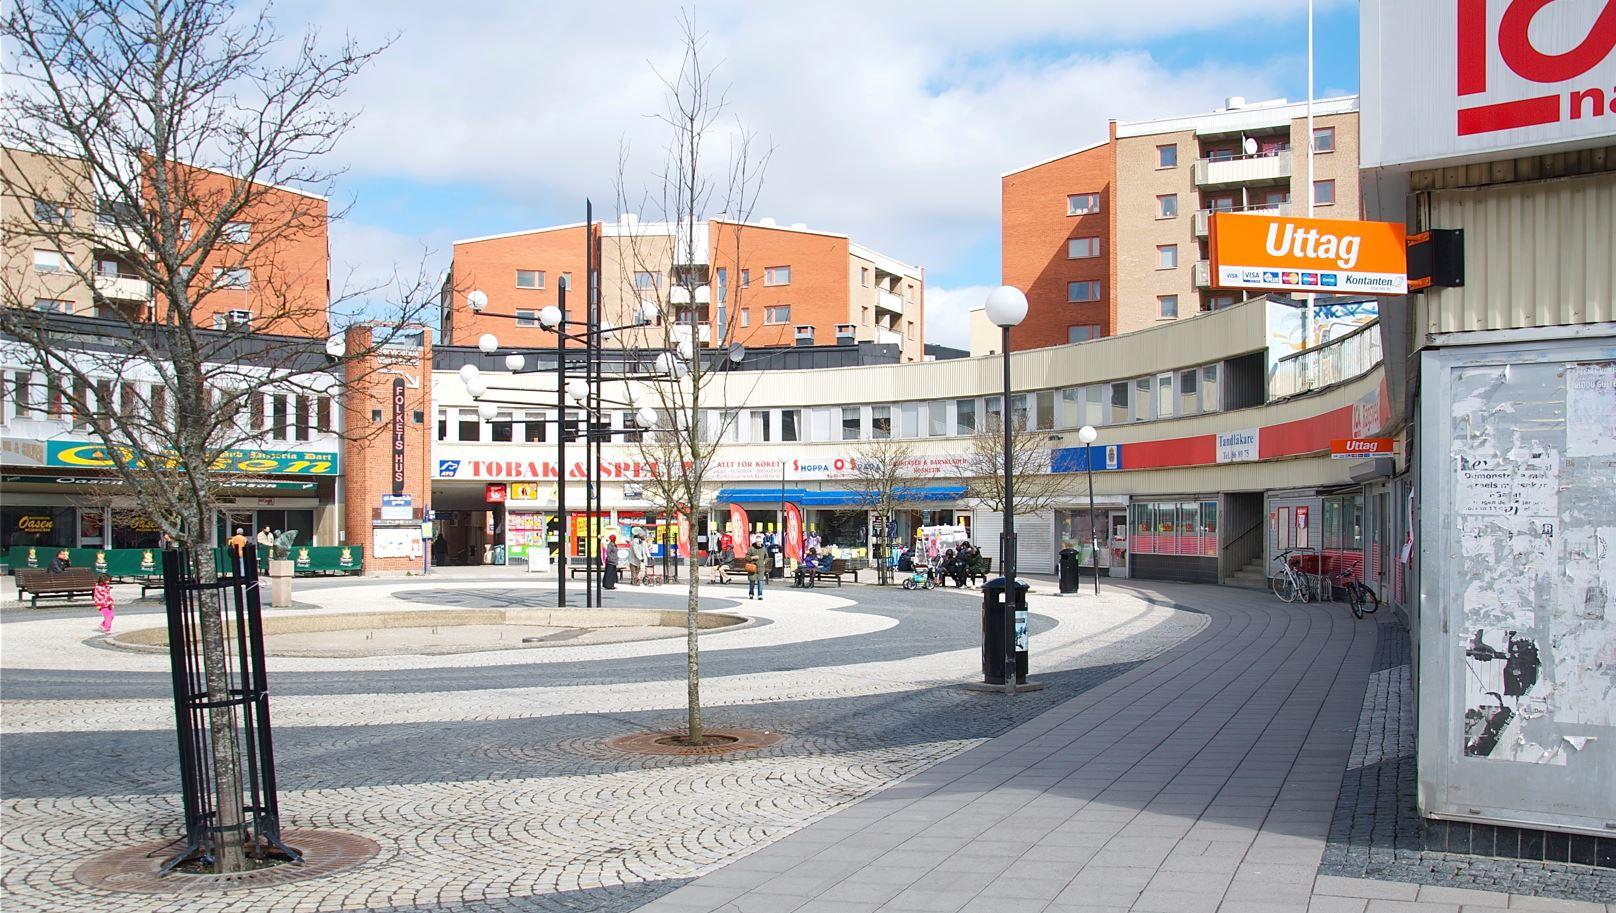 Foto: Arild Vågen - Eget arbete, CC BY-SA 3.0, https://commons.wikimedia.org/w/index.php?curid=19166322